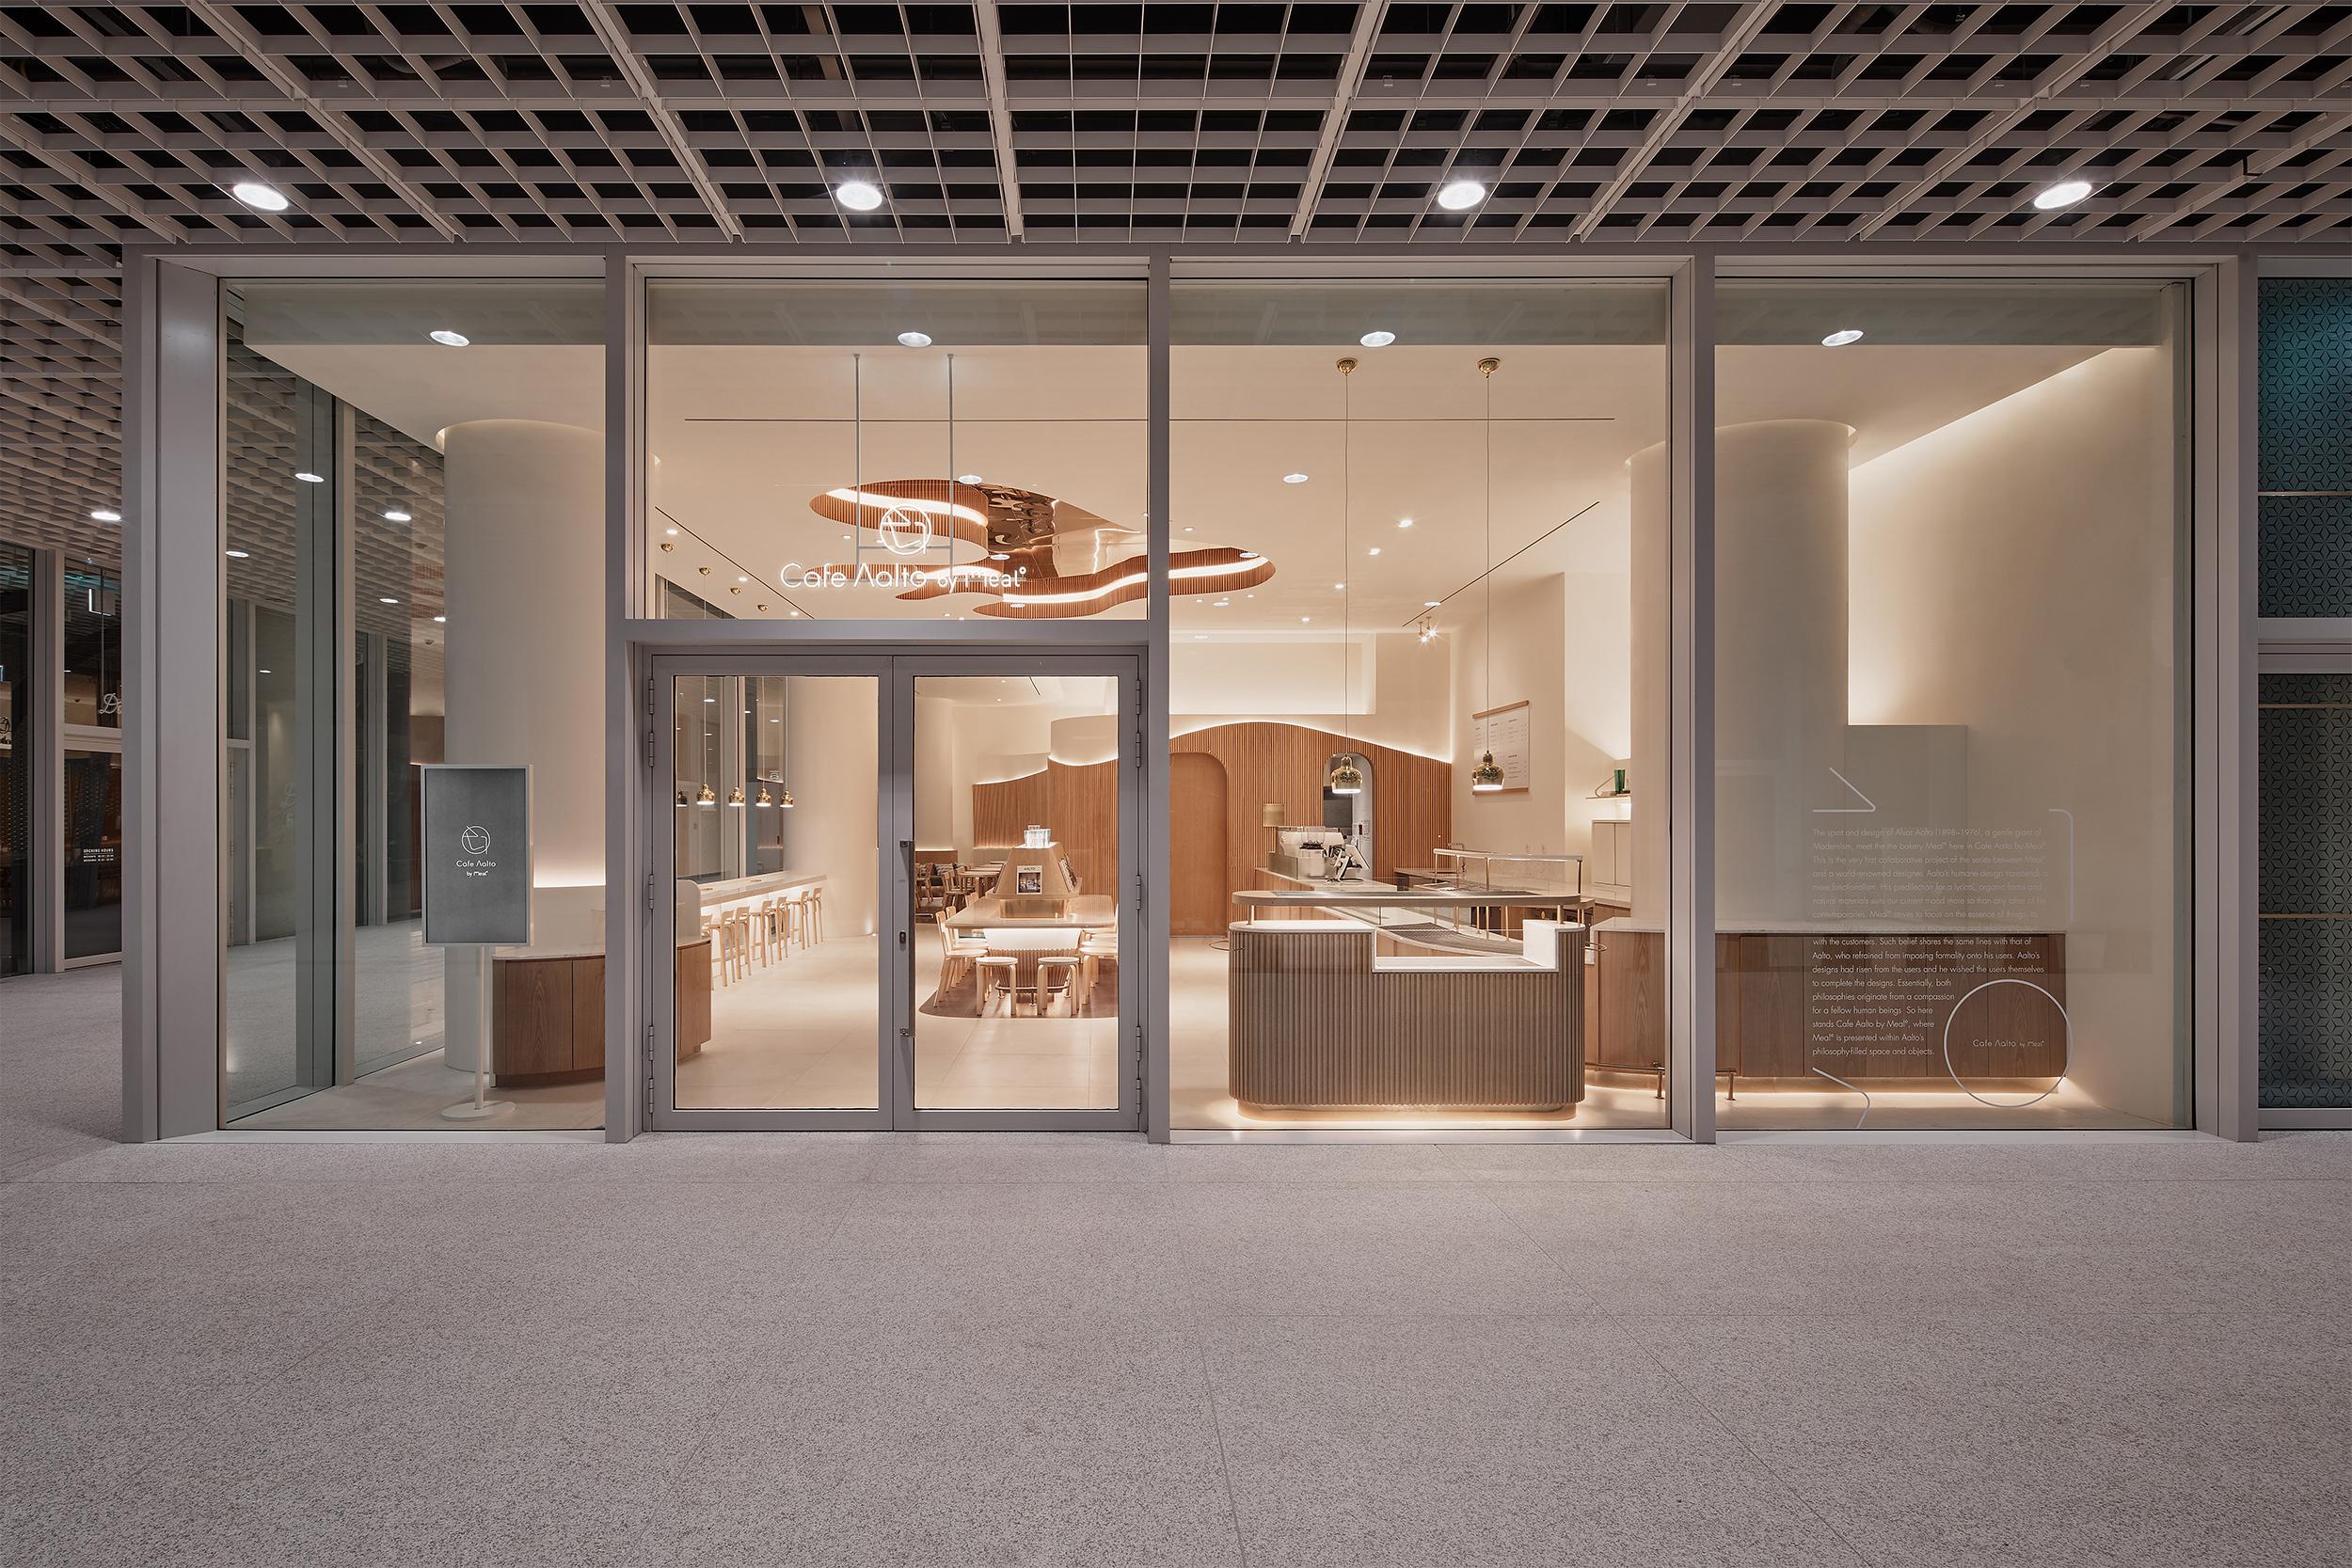 (Teo Yang Studio)Cafe Aalto by Mealdo_01_H resolution.jpg